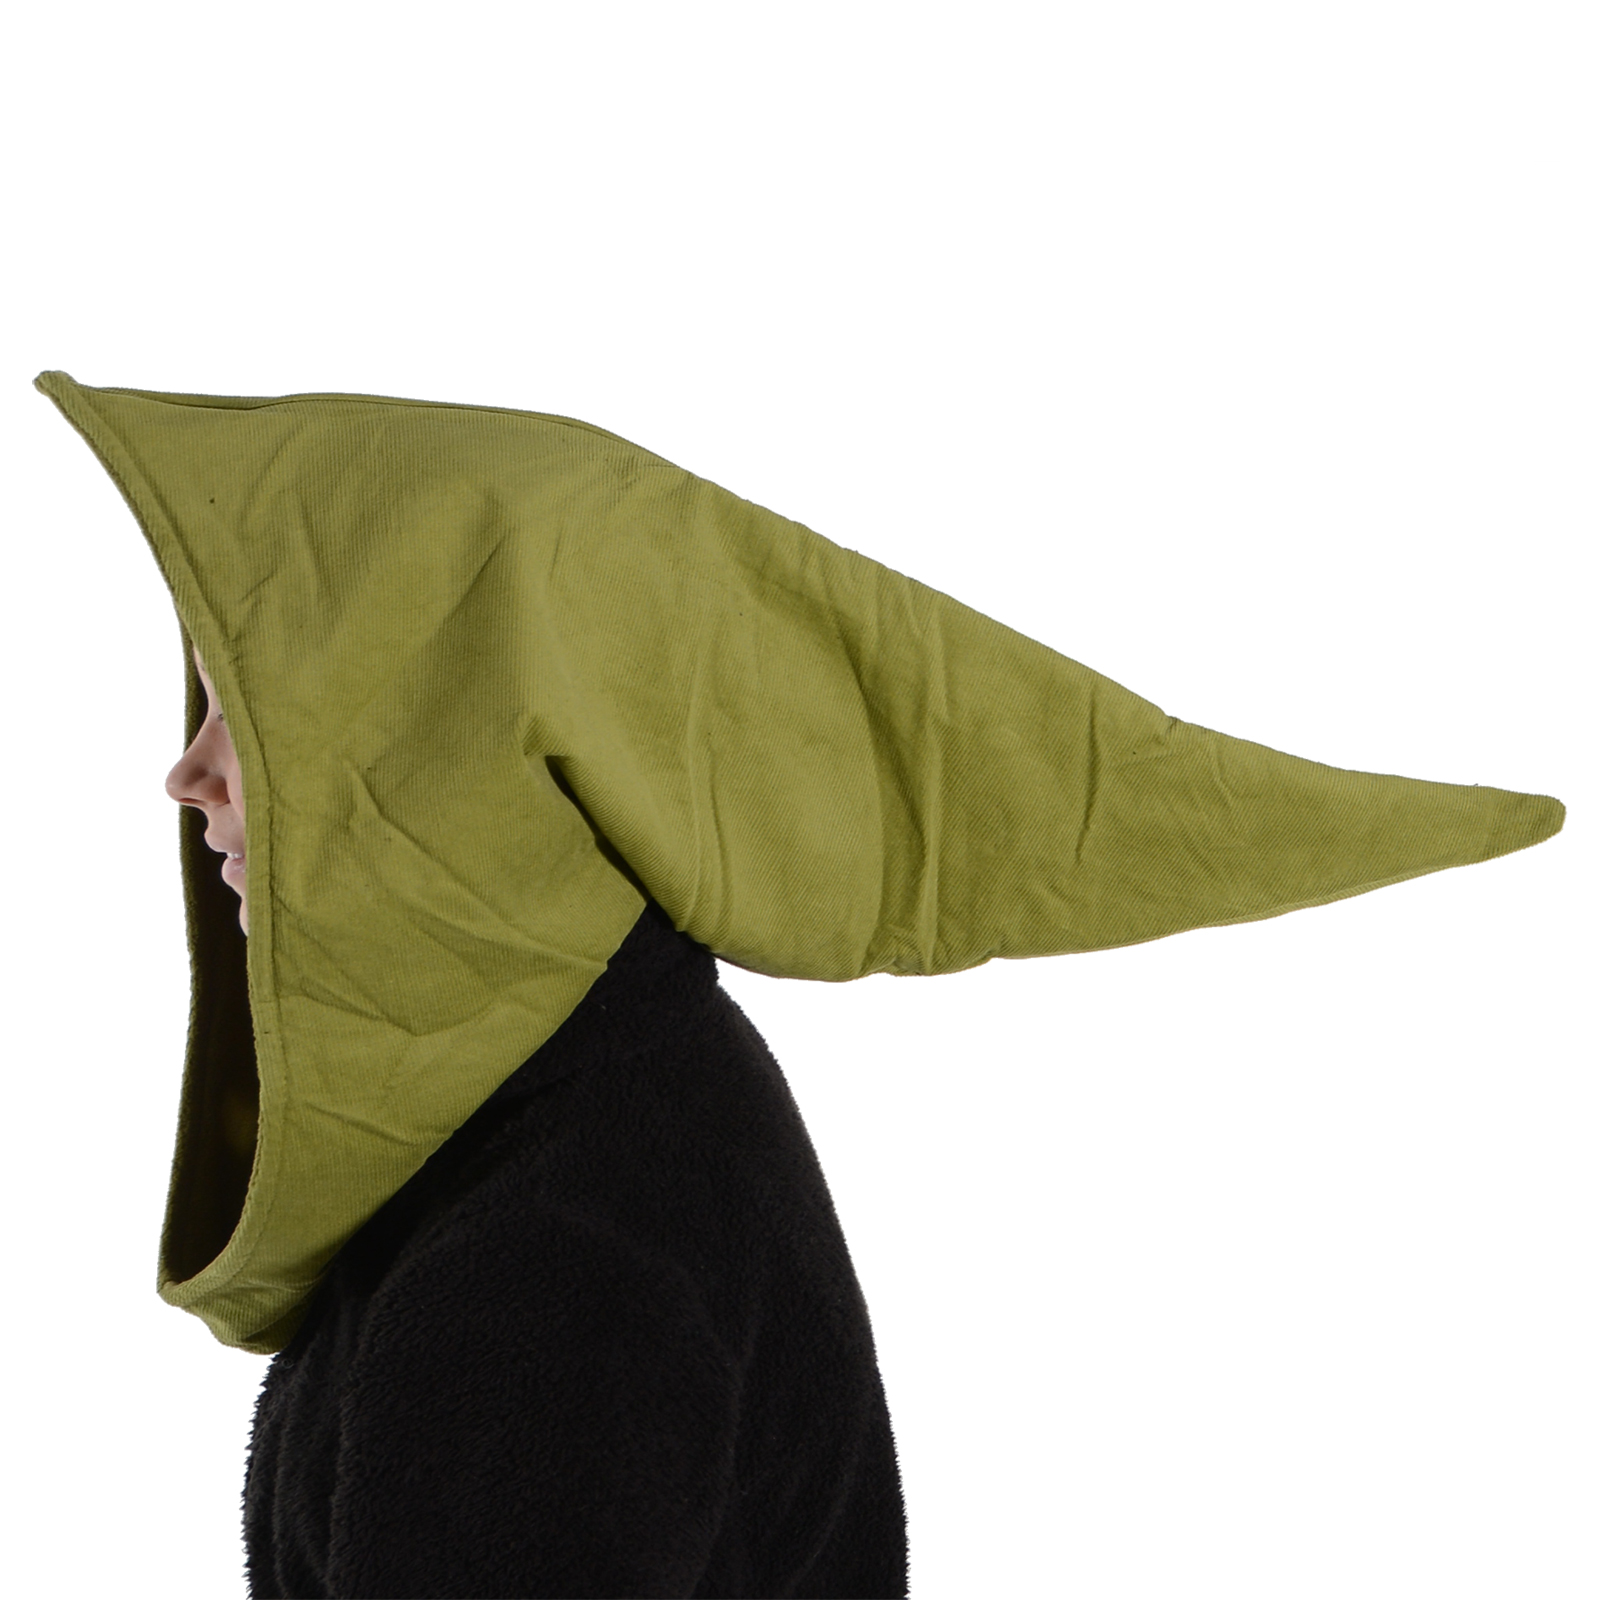 Kunst und Magie Goa Zipfelmütze Gugel Kapuze